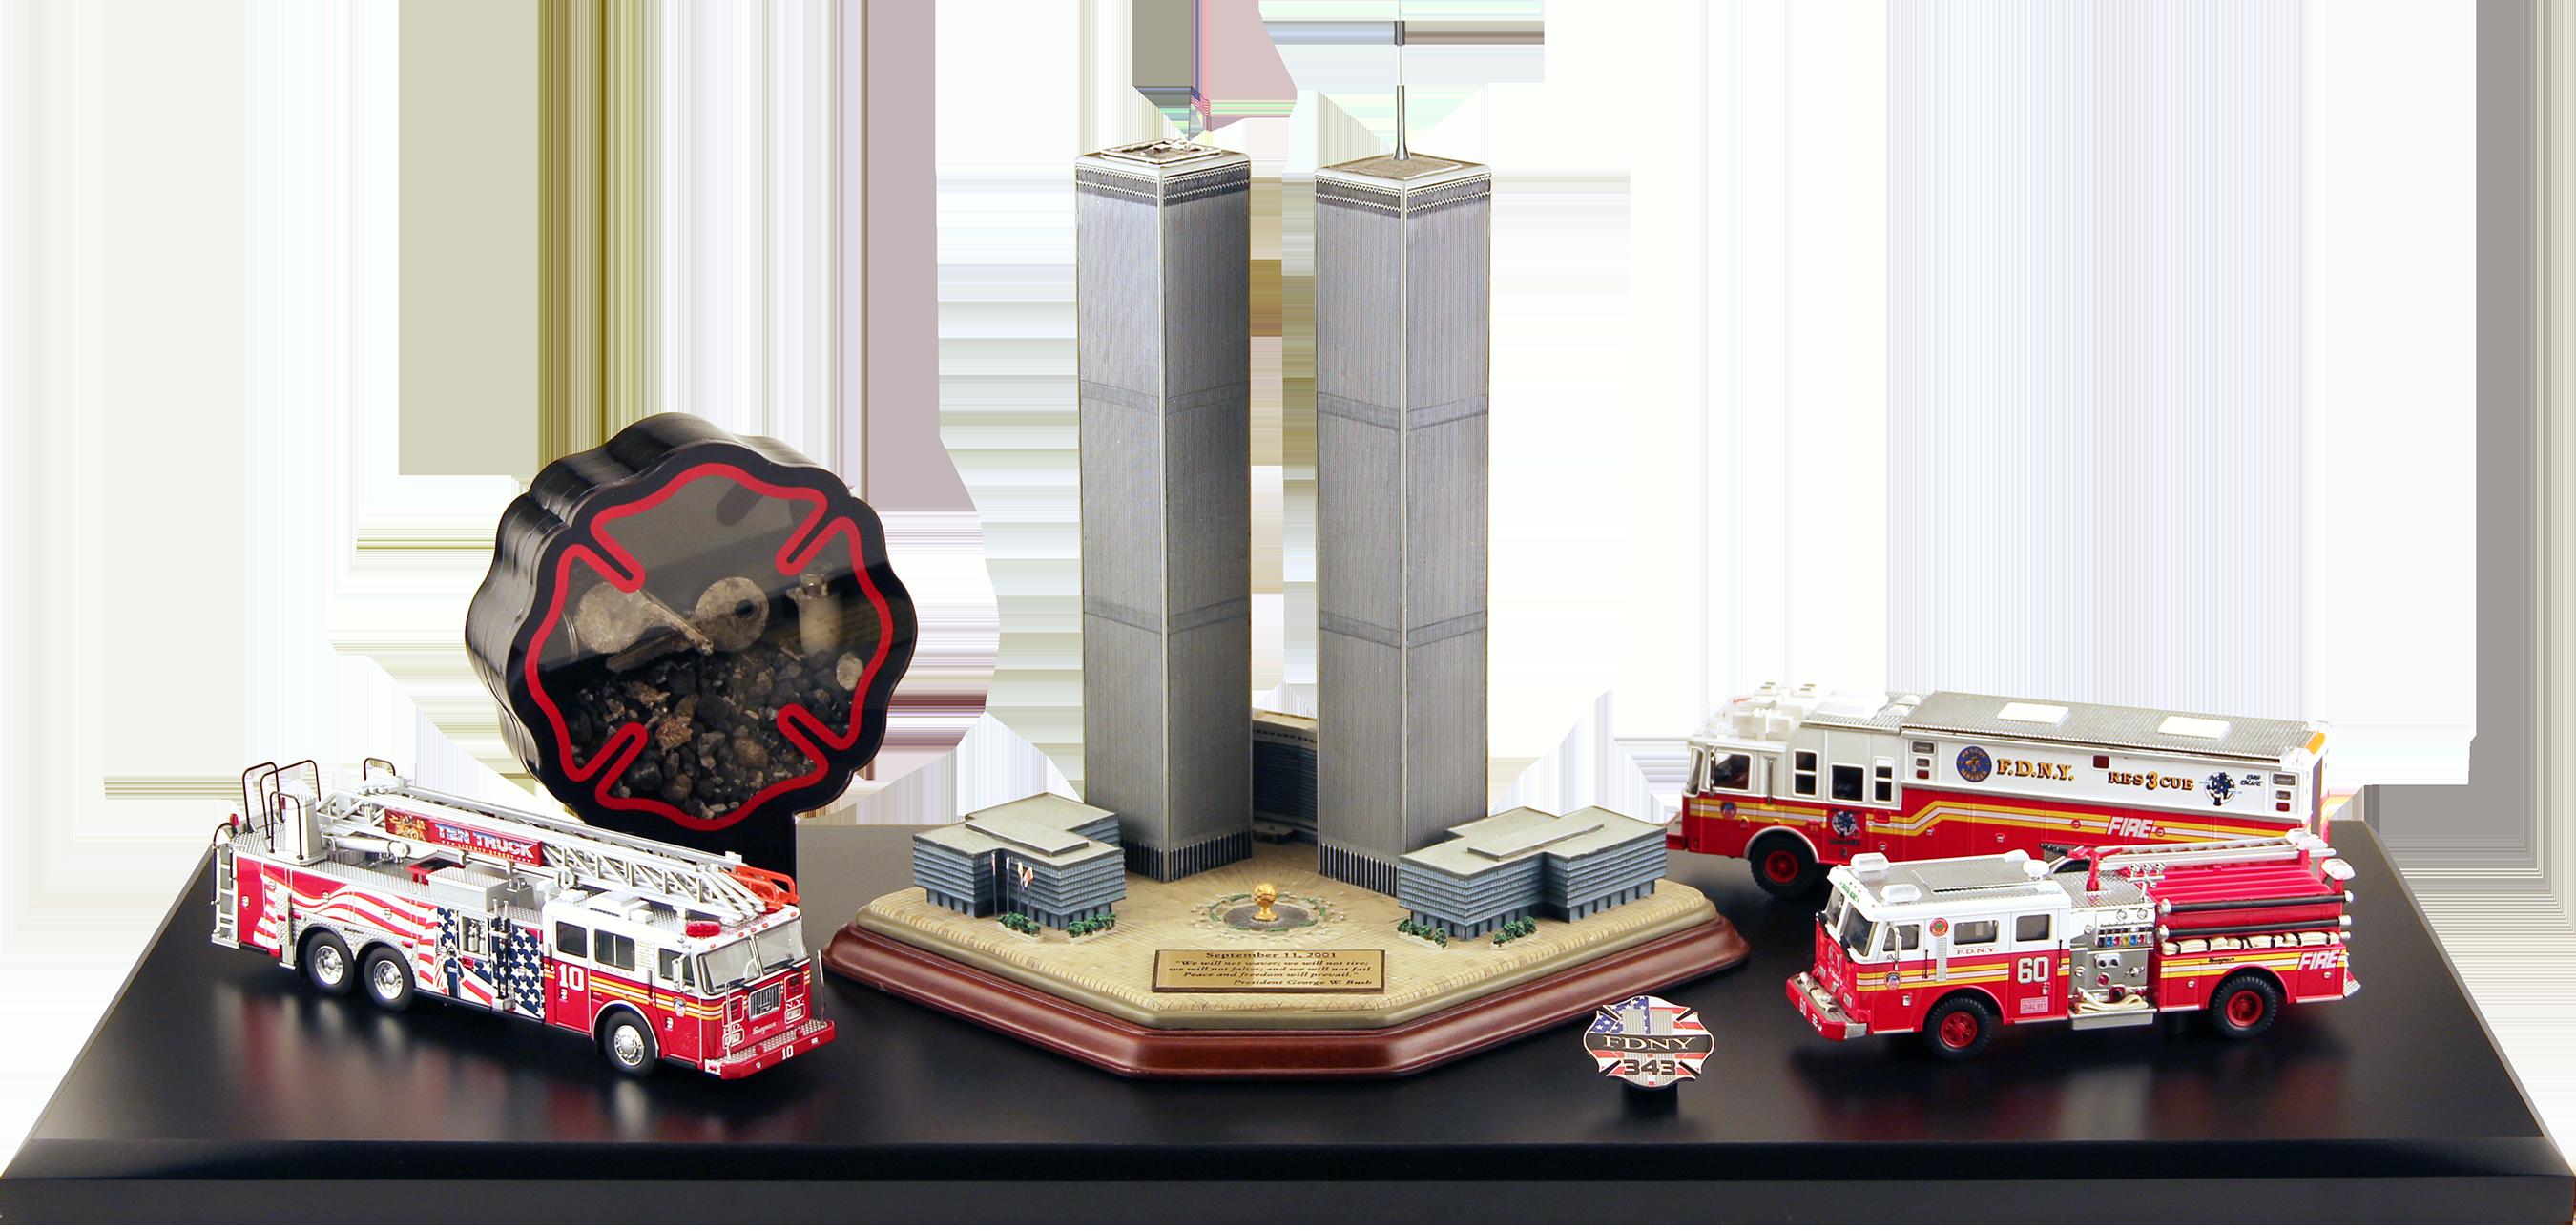 9/11 honor display